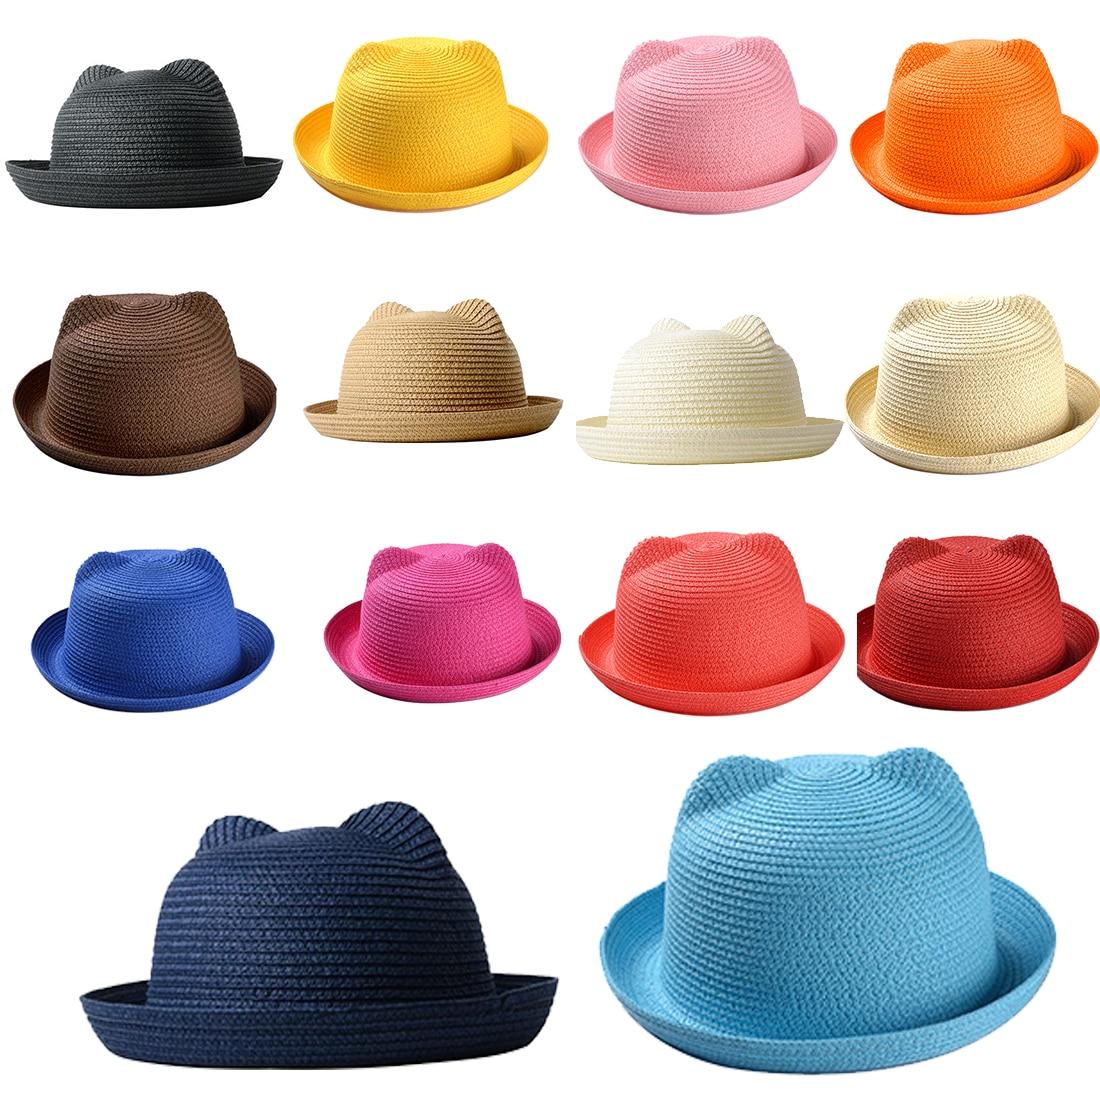 Panama children hats  Lovely Kids Children Solid Floppy Cat Ears Decor Cap Fashion Summer Baby Sun Hat for Girls Boys